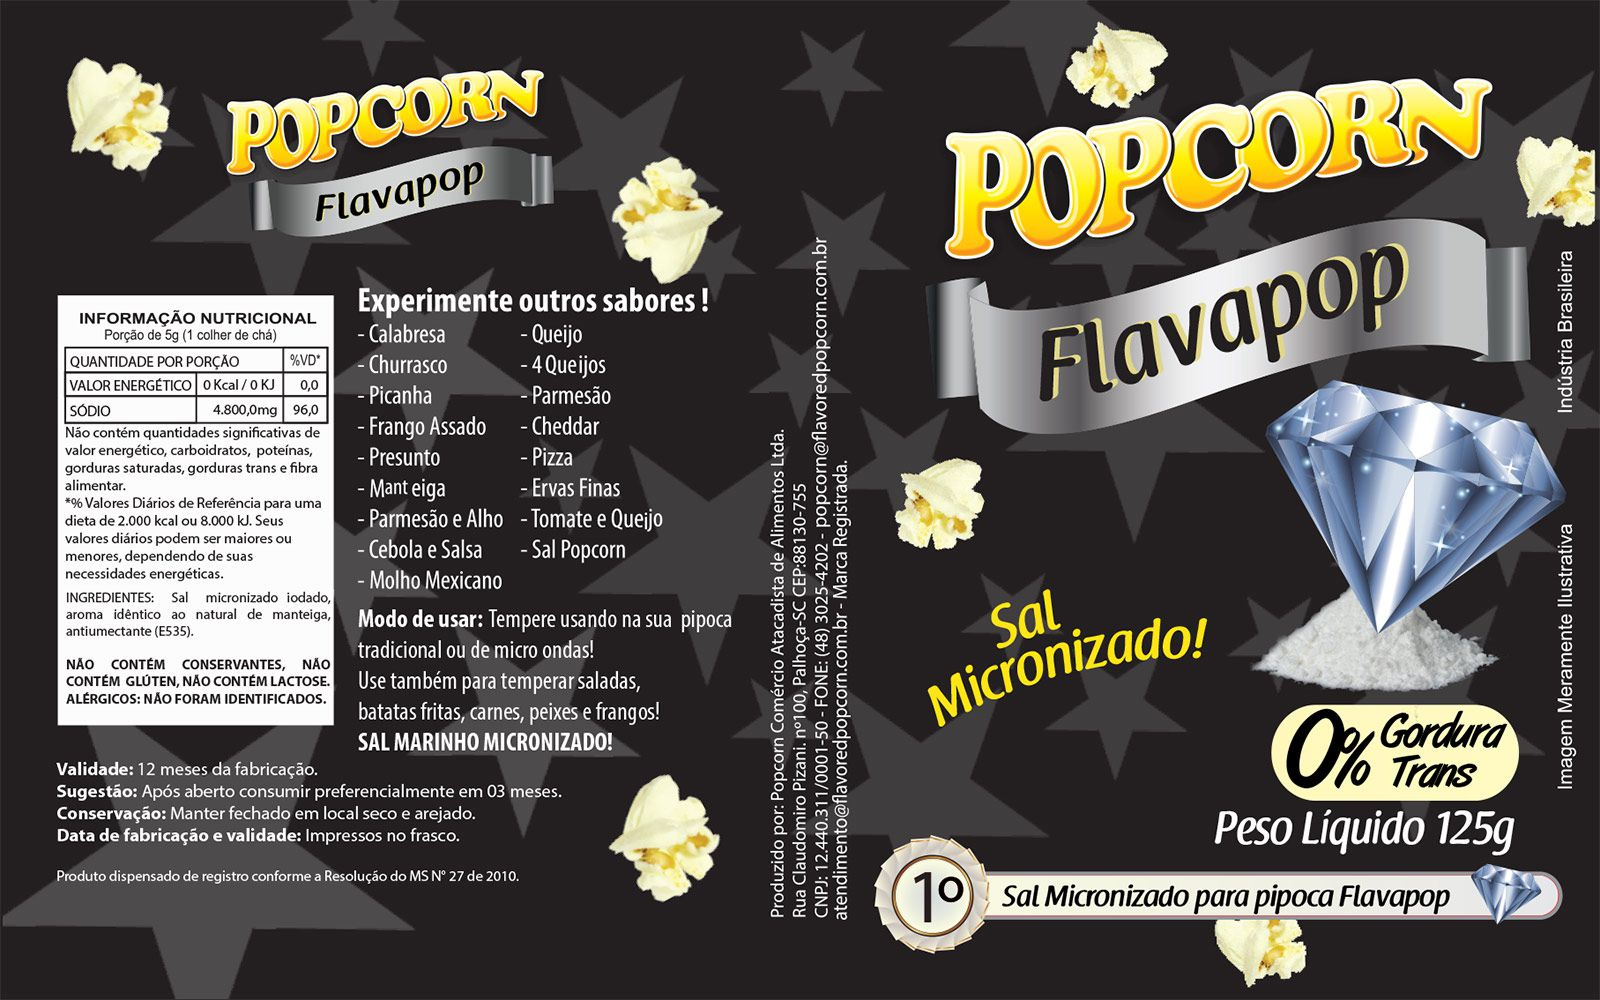 FLAVAPOP - Manteiga - original de Cinema - Sal Micronizado Popcorn  - Pct 1kg